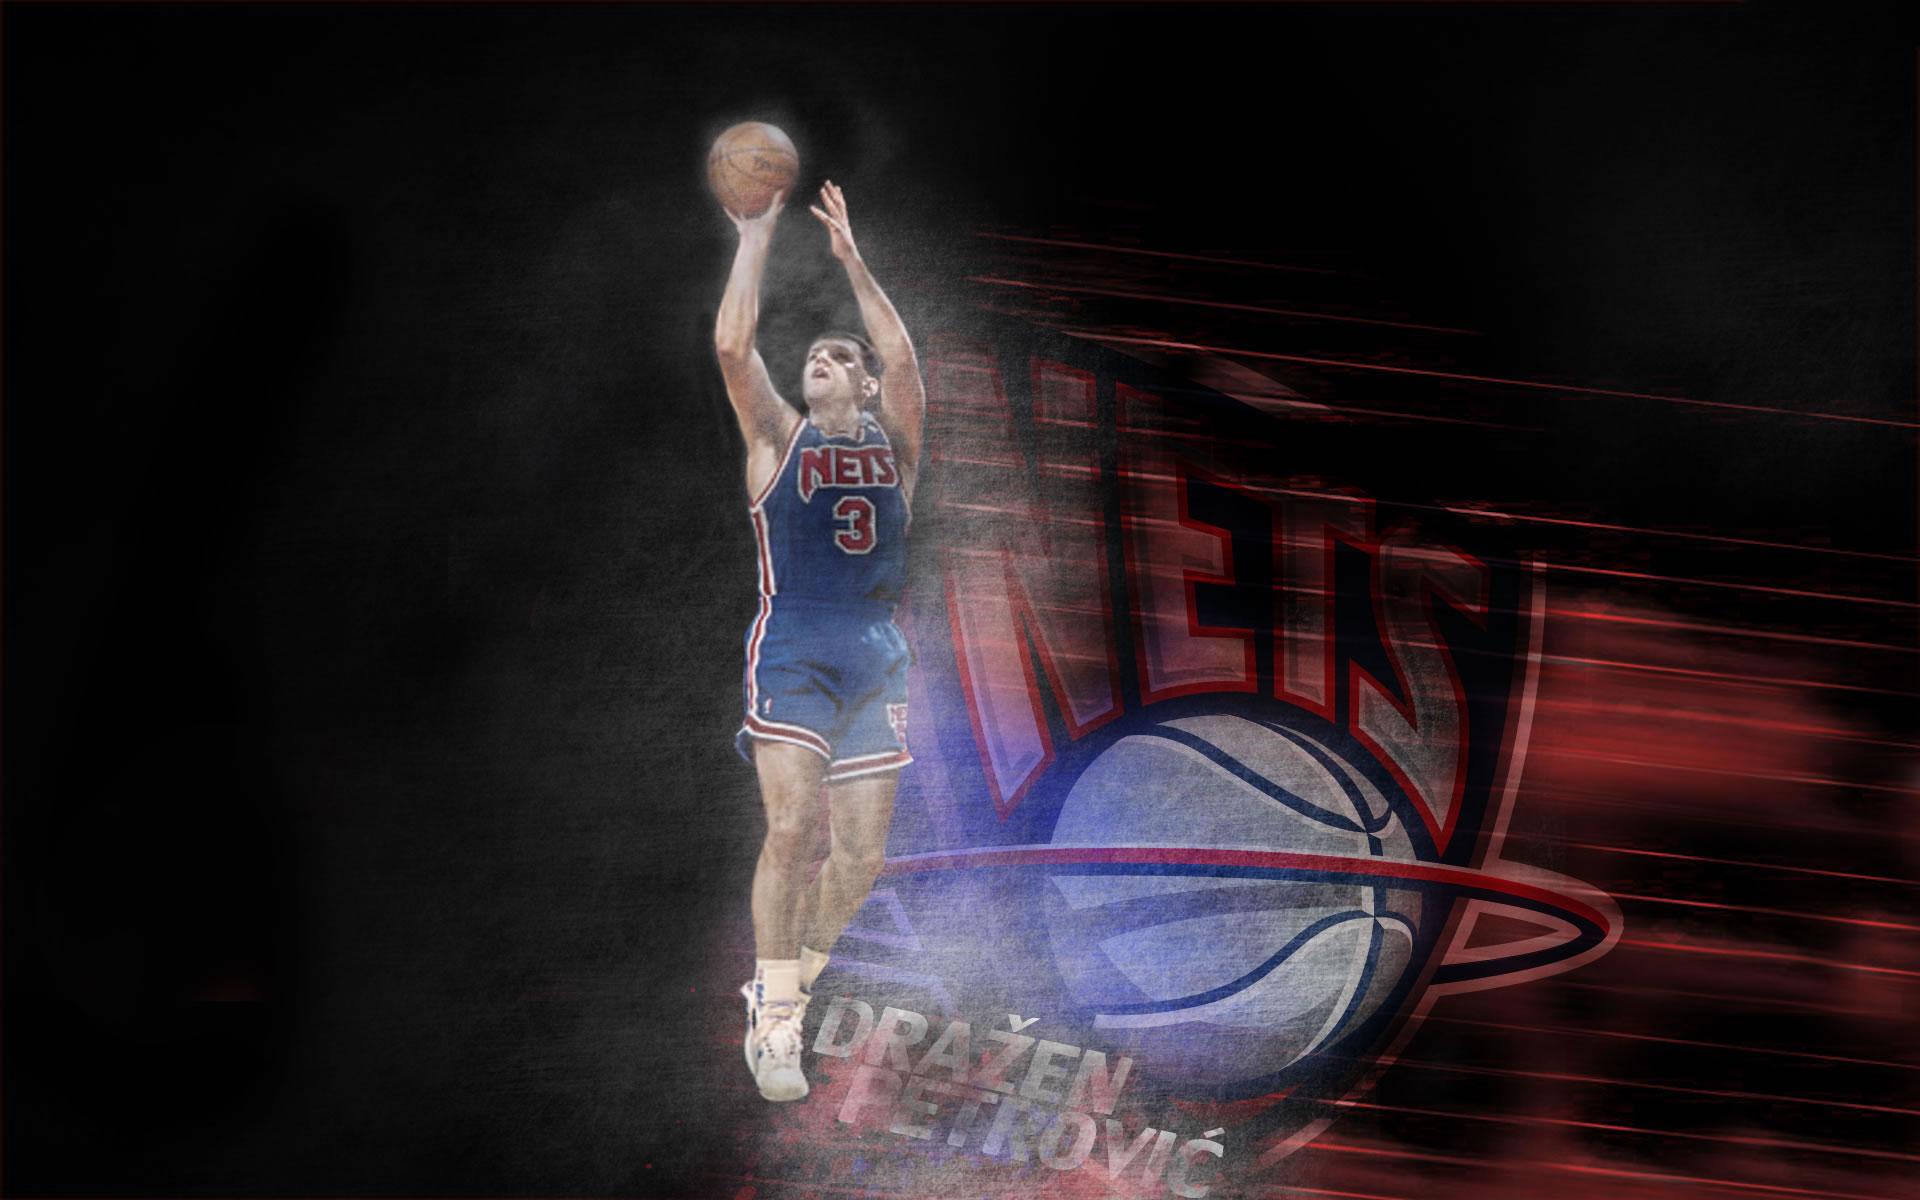 Wallpaper Drazen Petrovic con los New Jersey Nets